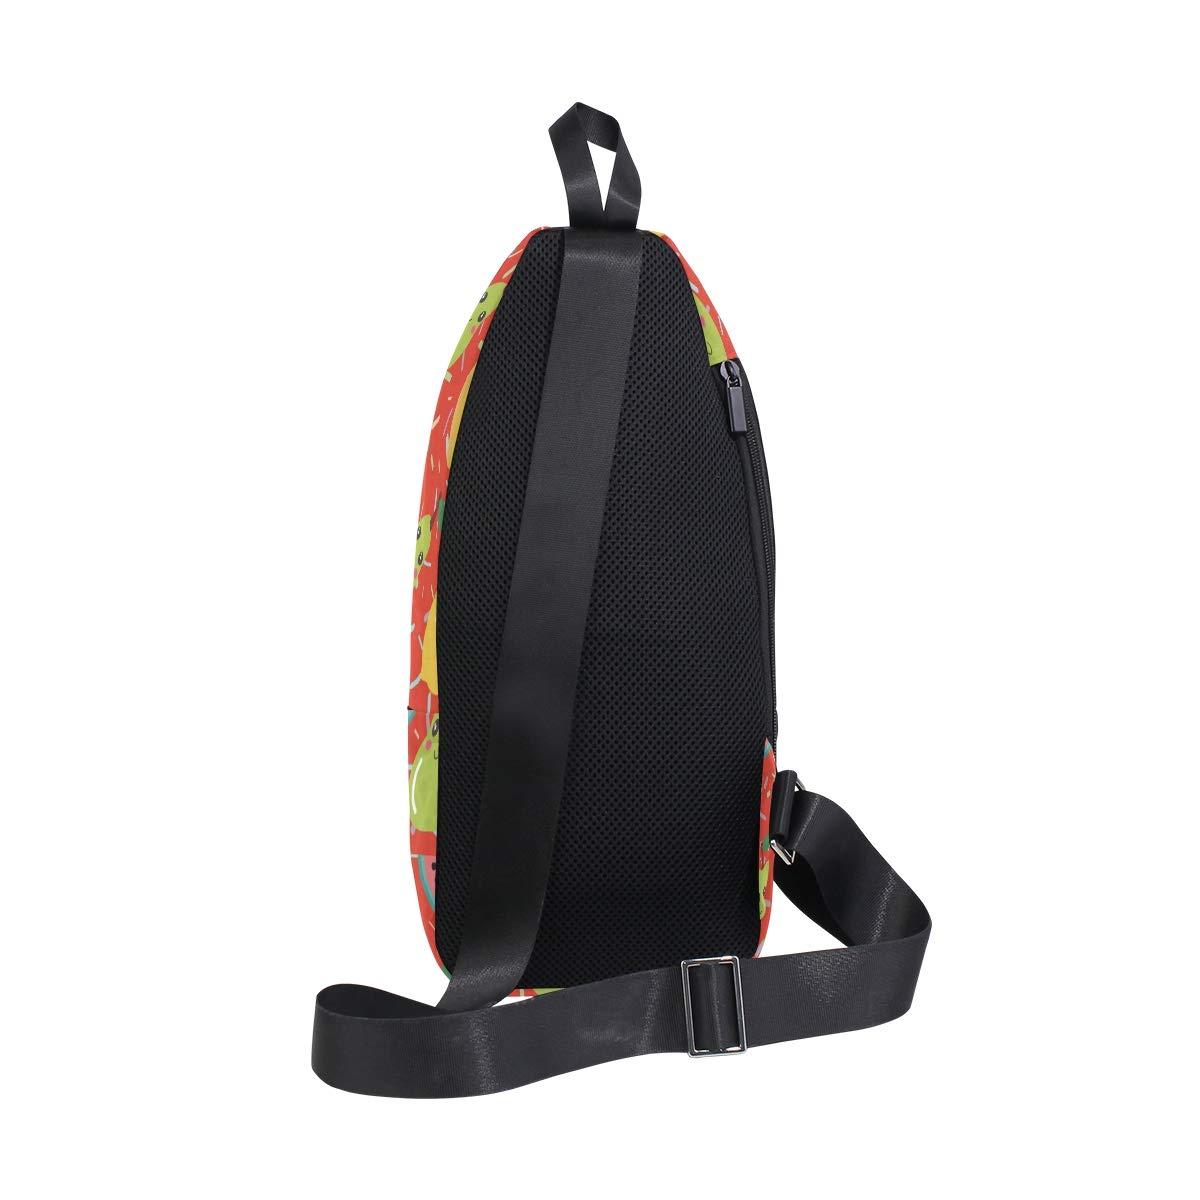 Unisex Messenger Bag Cartoon Watermelon Banana Shoulder Chest Cross Body Backpack Bag